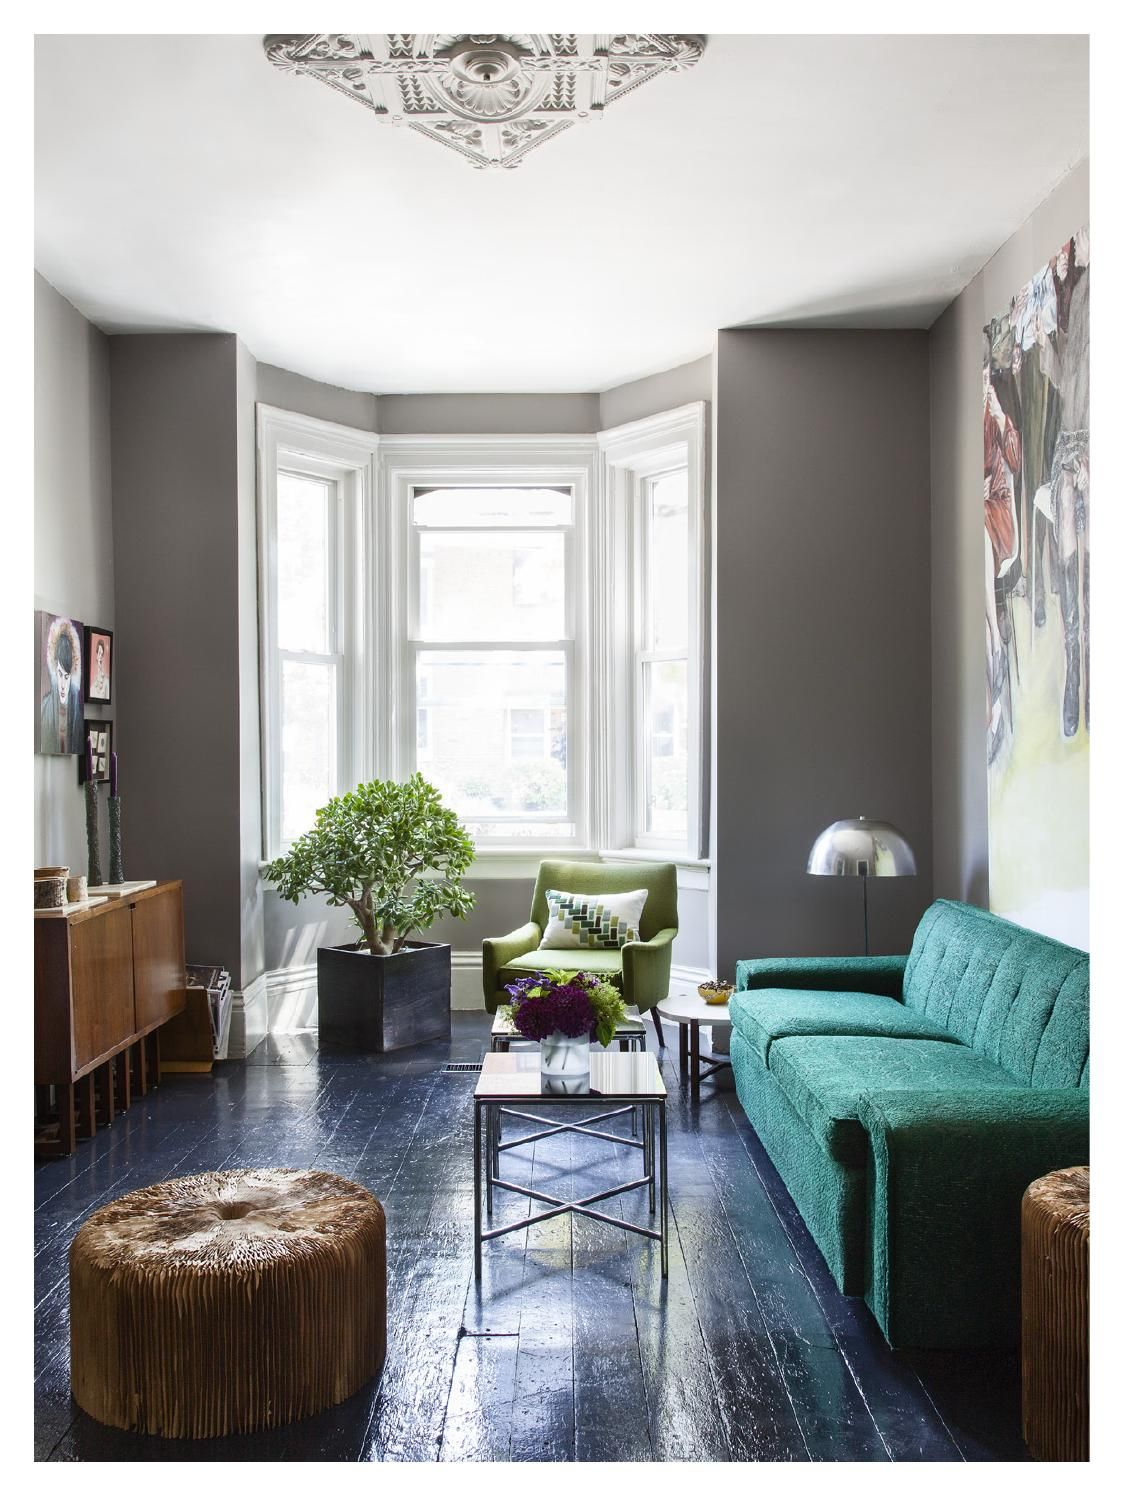 10 Best Victorian Living Room Decorating Ideas